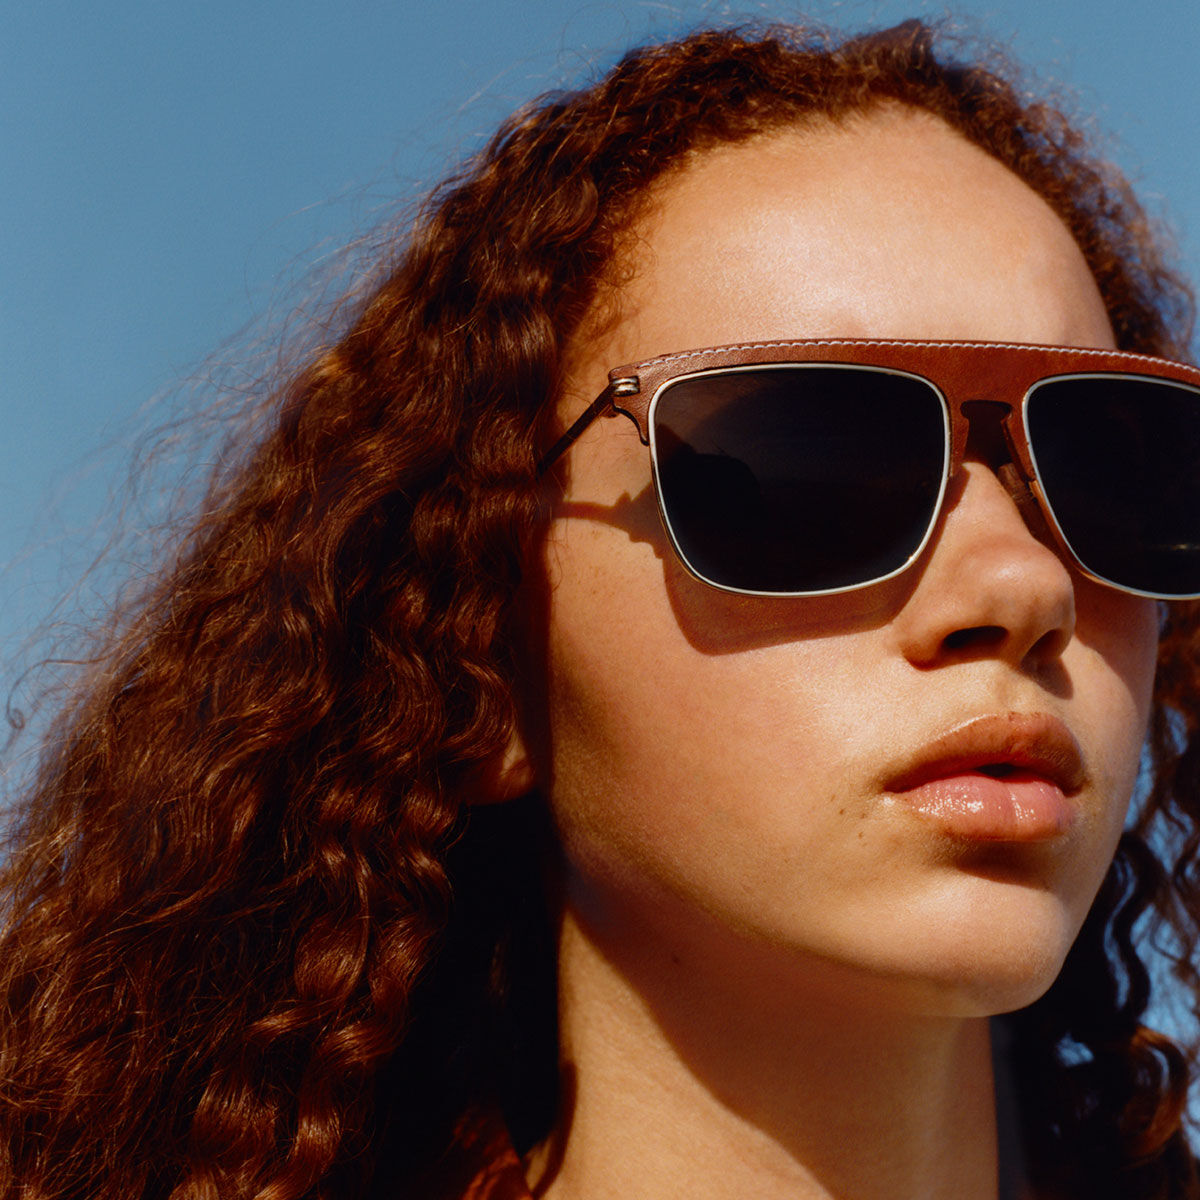 LOEWE Square Sunglasses Brown/Dark Brown all